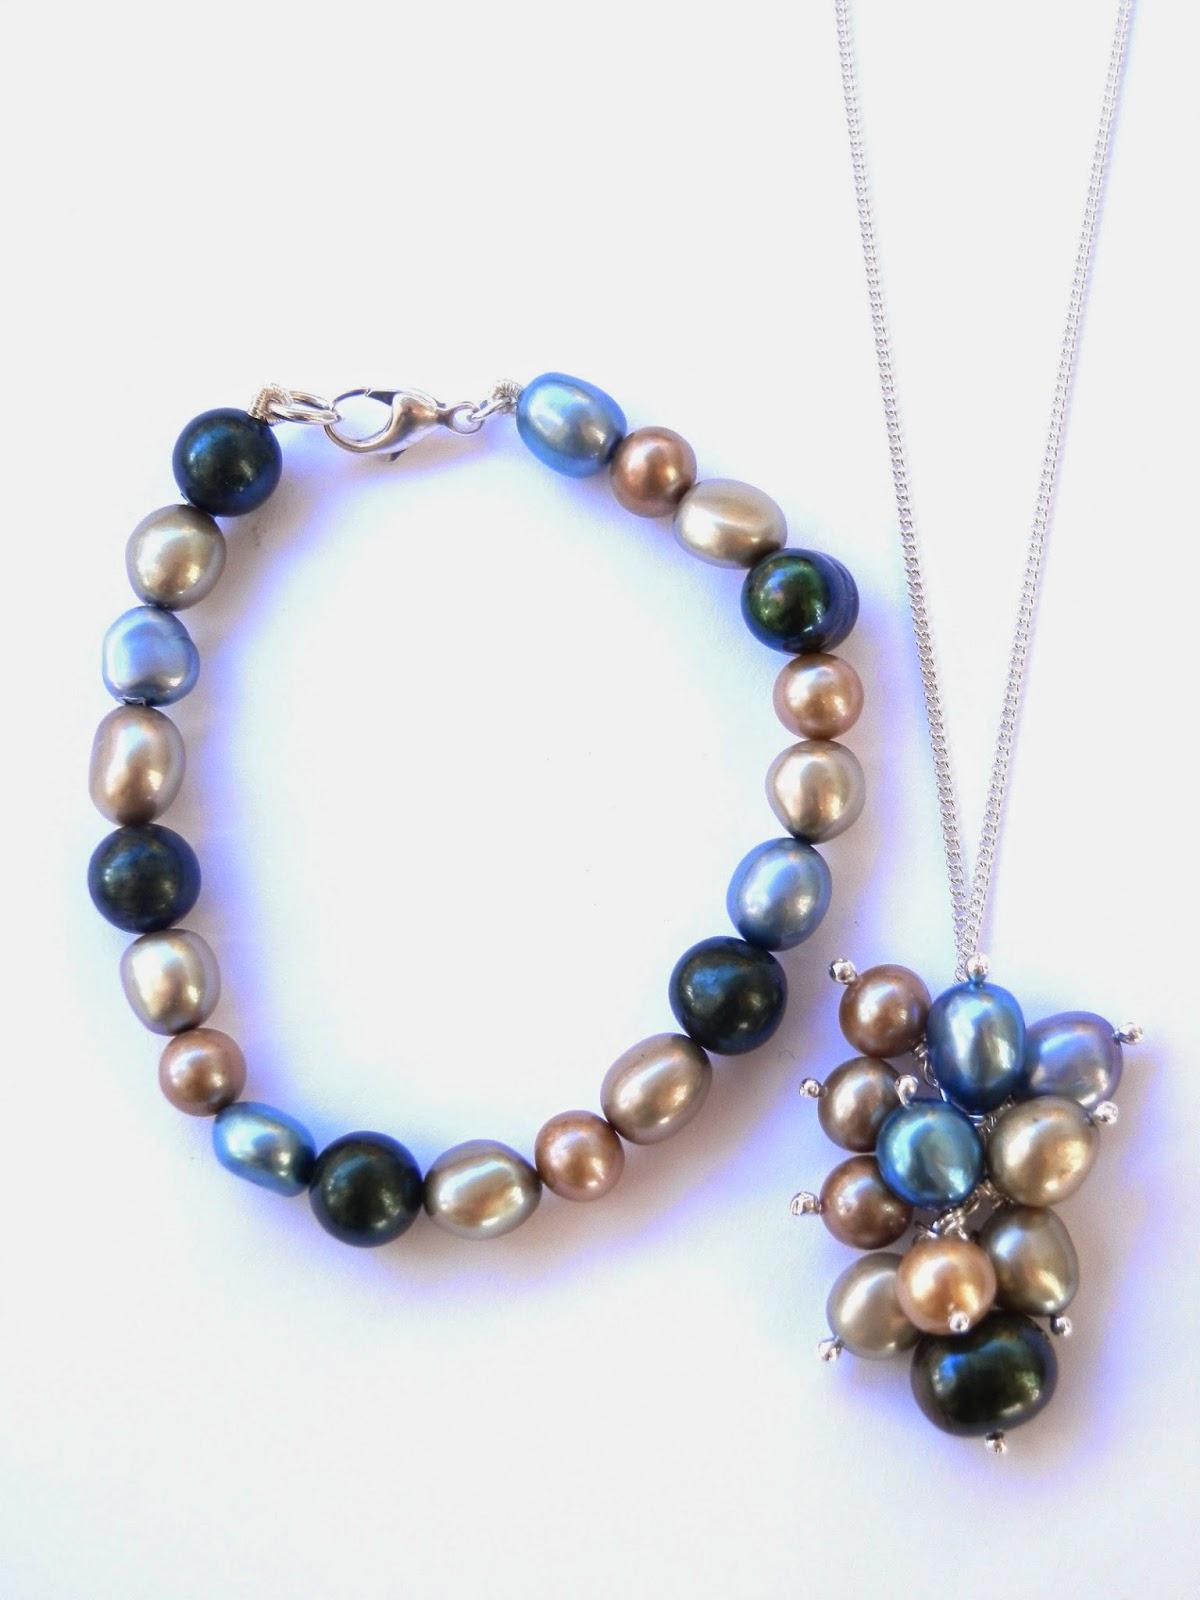 http://www.kirstytaylorjewellery.com/pearl-bracelets/501-sea-green-blue-gold-freshwater-pearl-bracelet.html?search_query=pearls&results=41